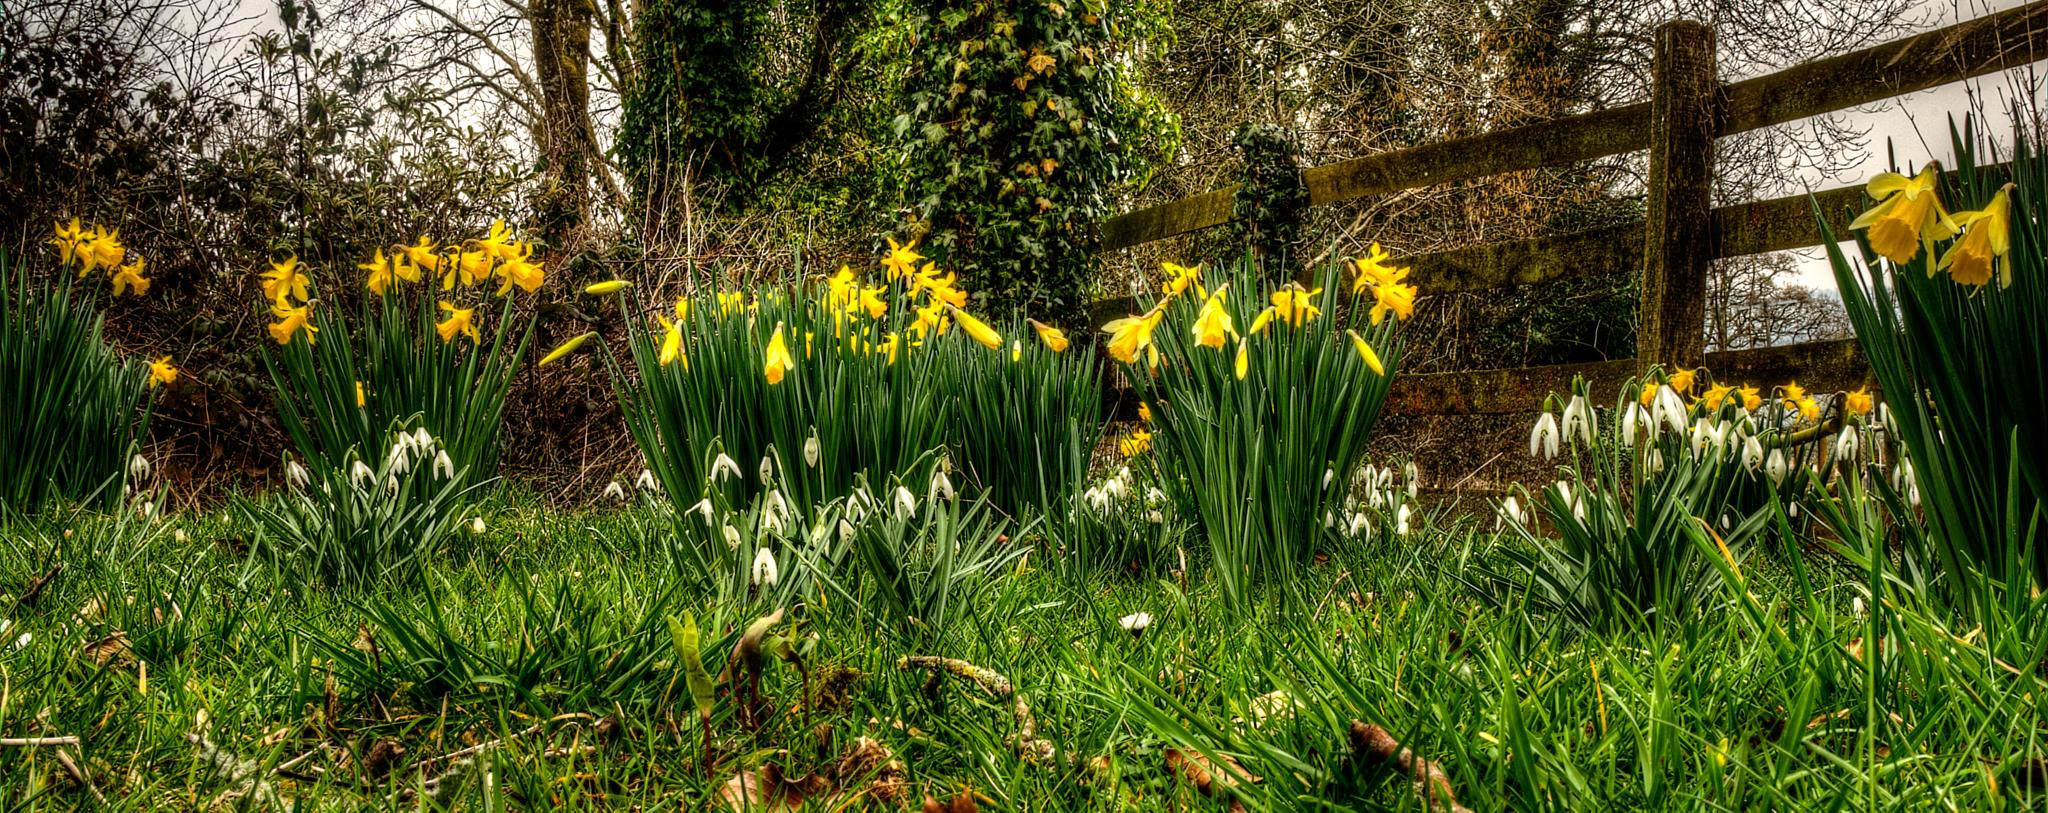 Spring Garden by mike.lloyd.125